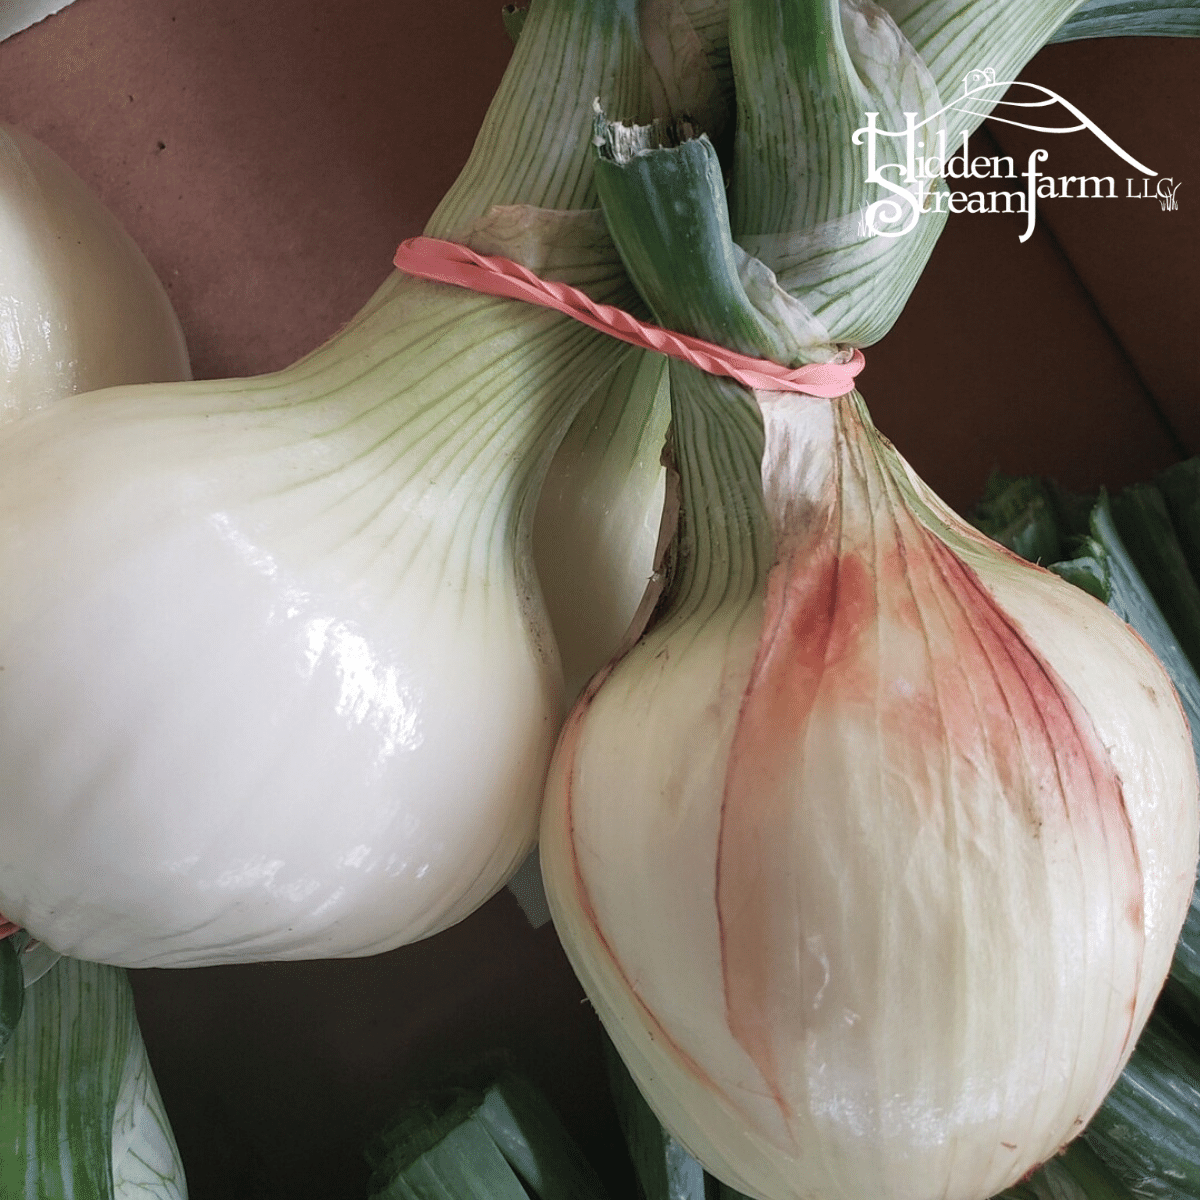 Onions, 2lb